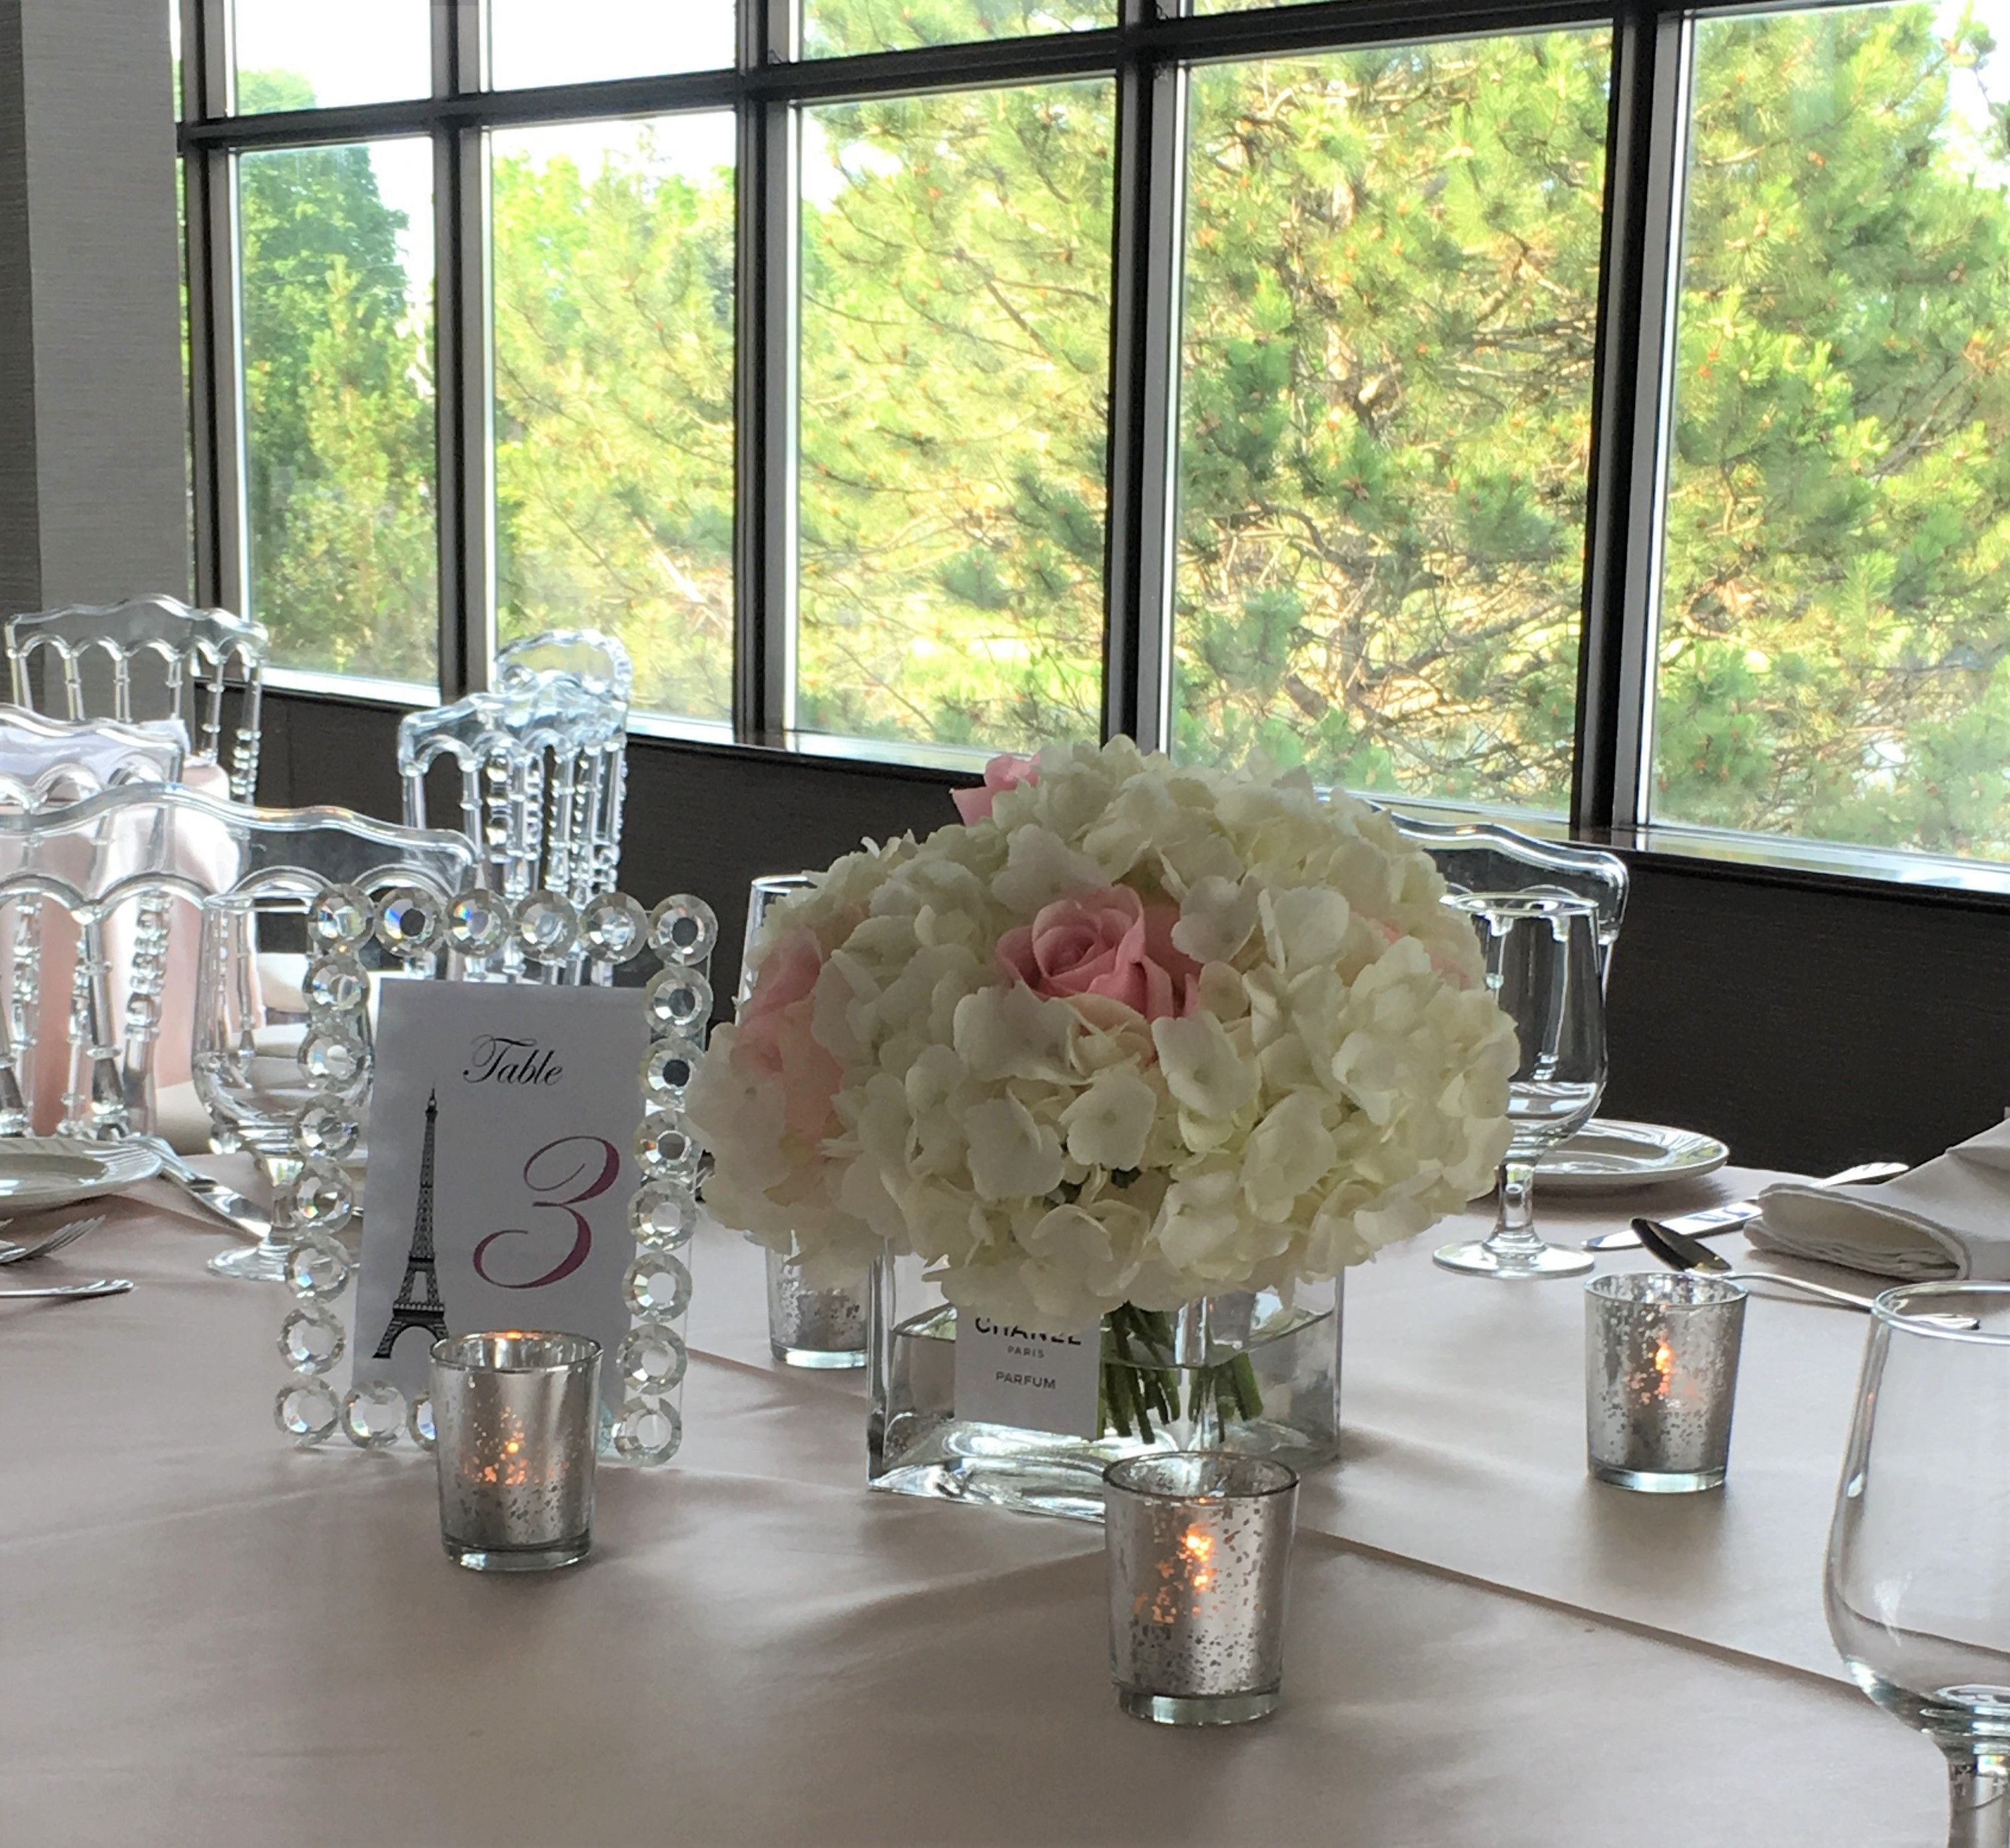 Night wedding decor ideas  A Night In Paris  Planning Design u Decor Rentals Blissful